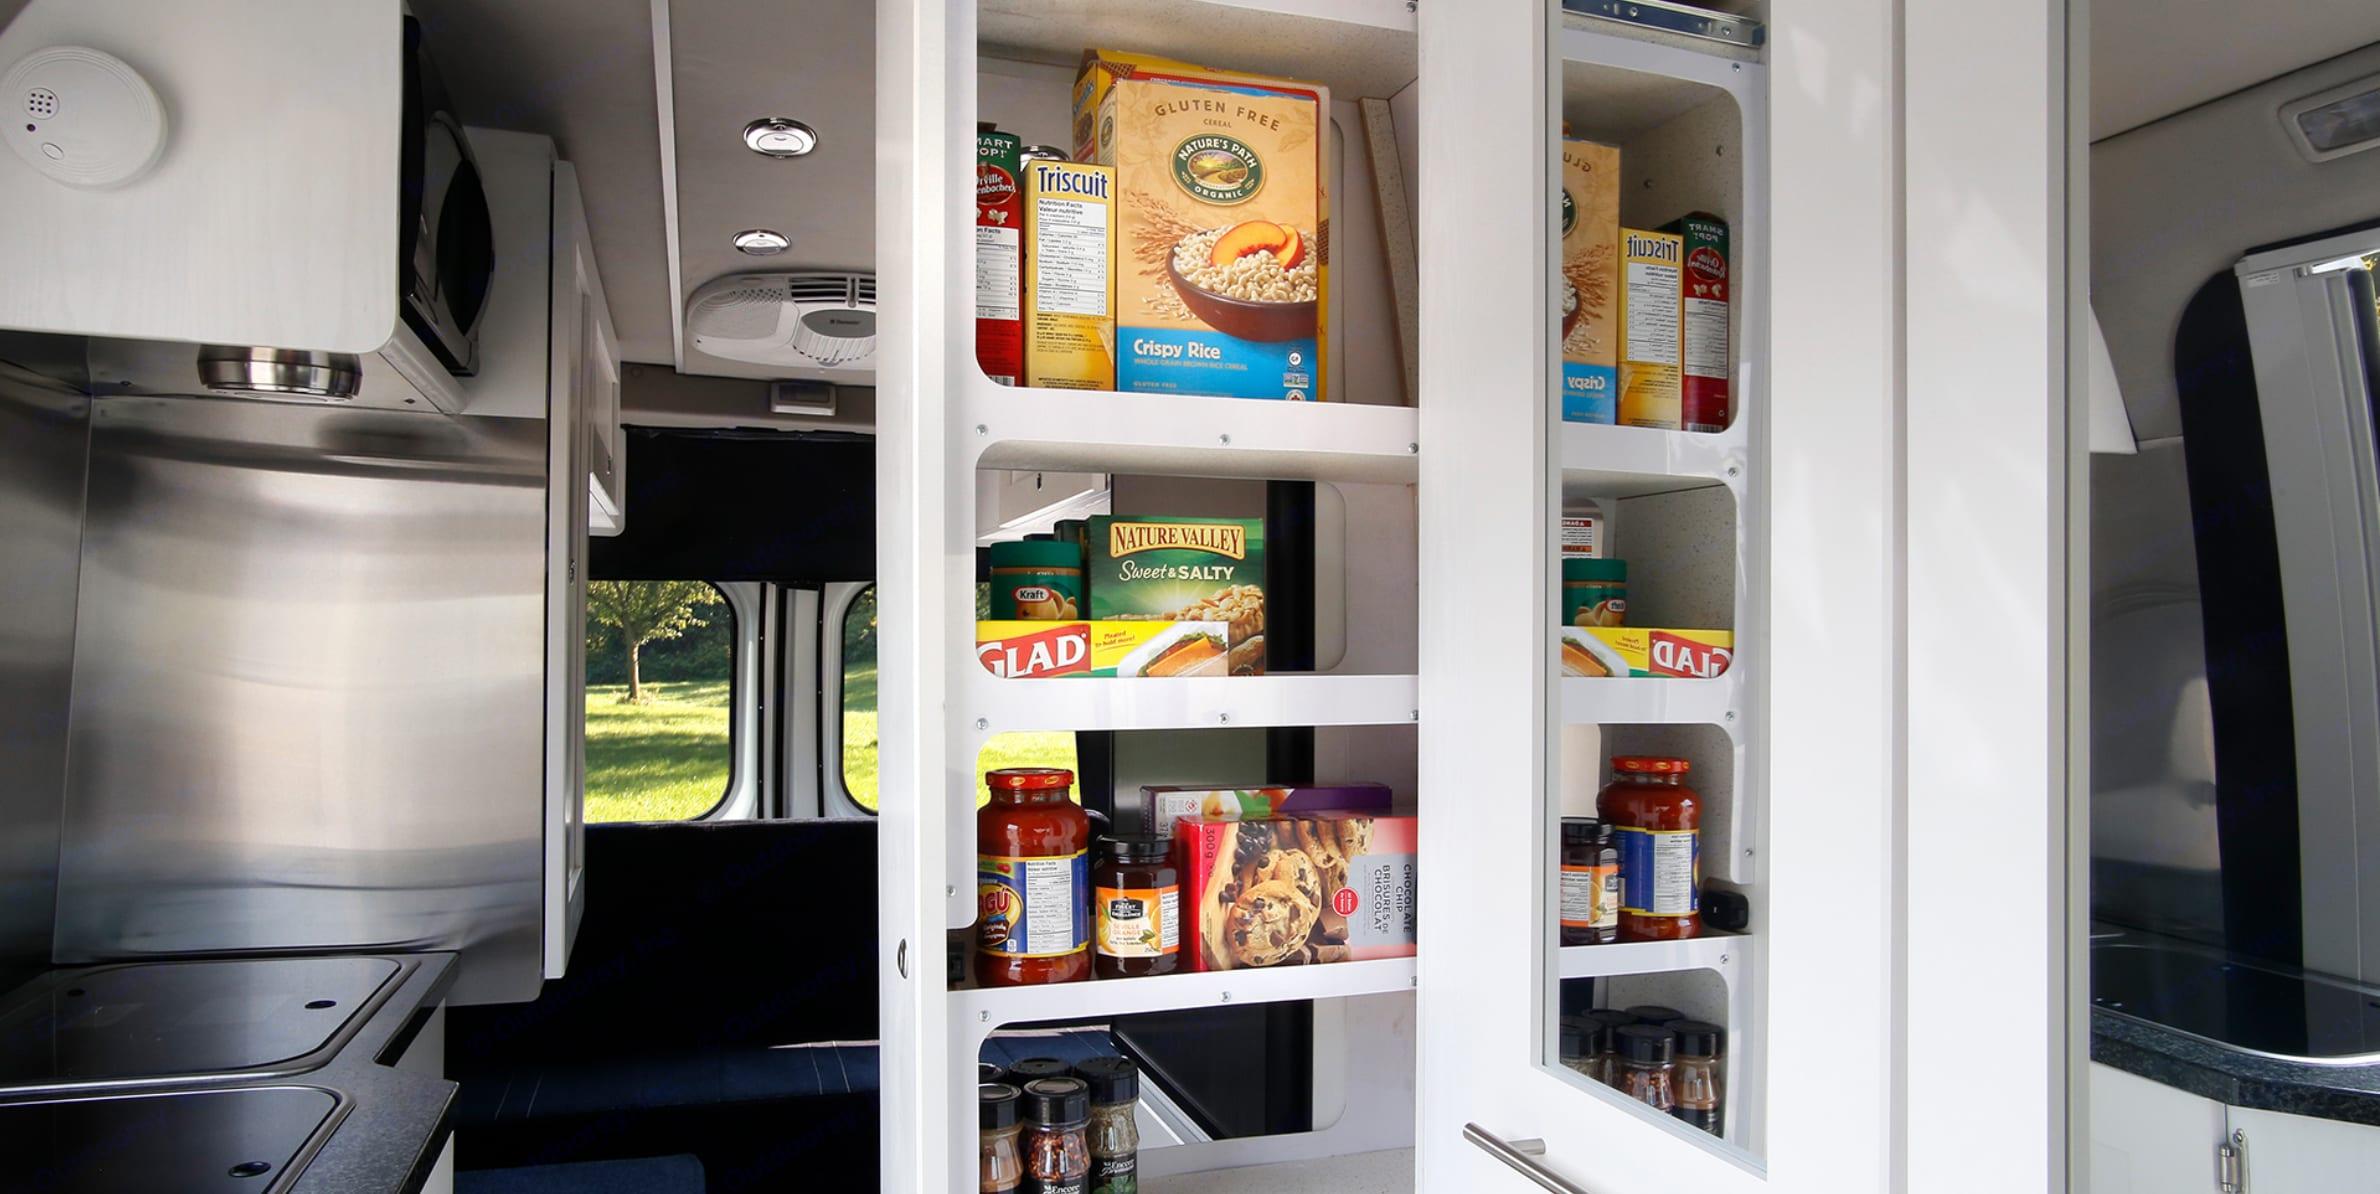 Large slide-out pantry - food not included :) (Source: Roadtrek). Roadtrek Zion SRT 2019